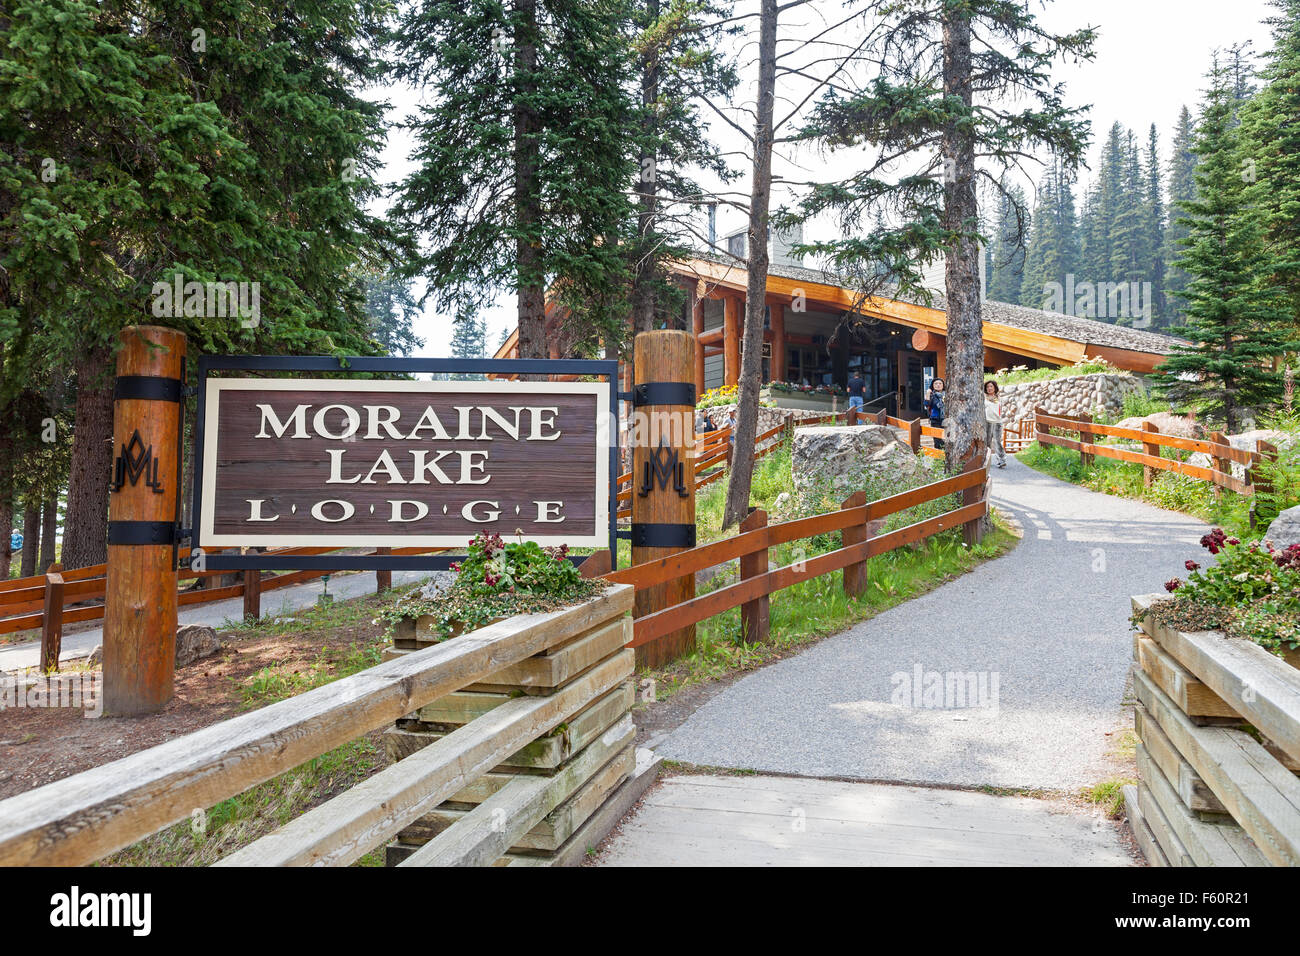 Moraine Lake Lodge Banff National Park Alberta Canada Wooden